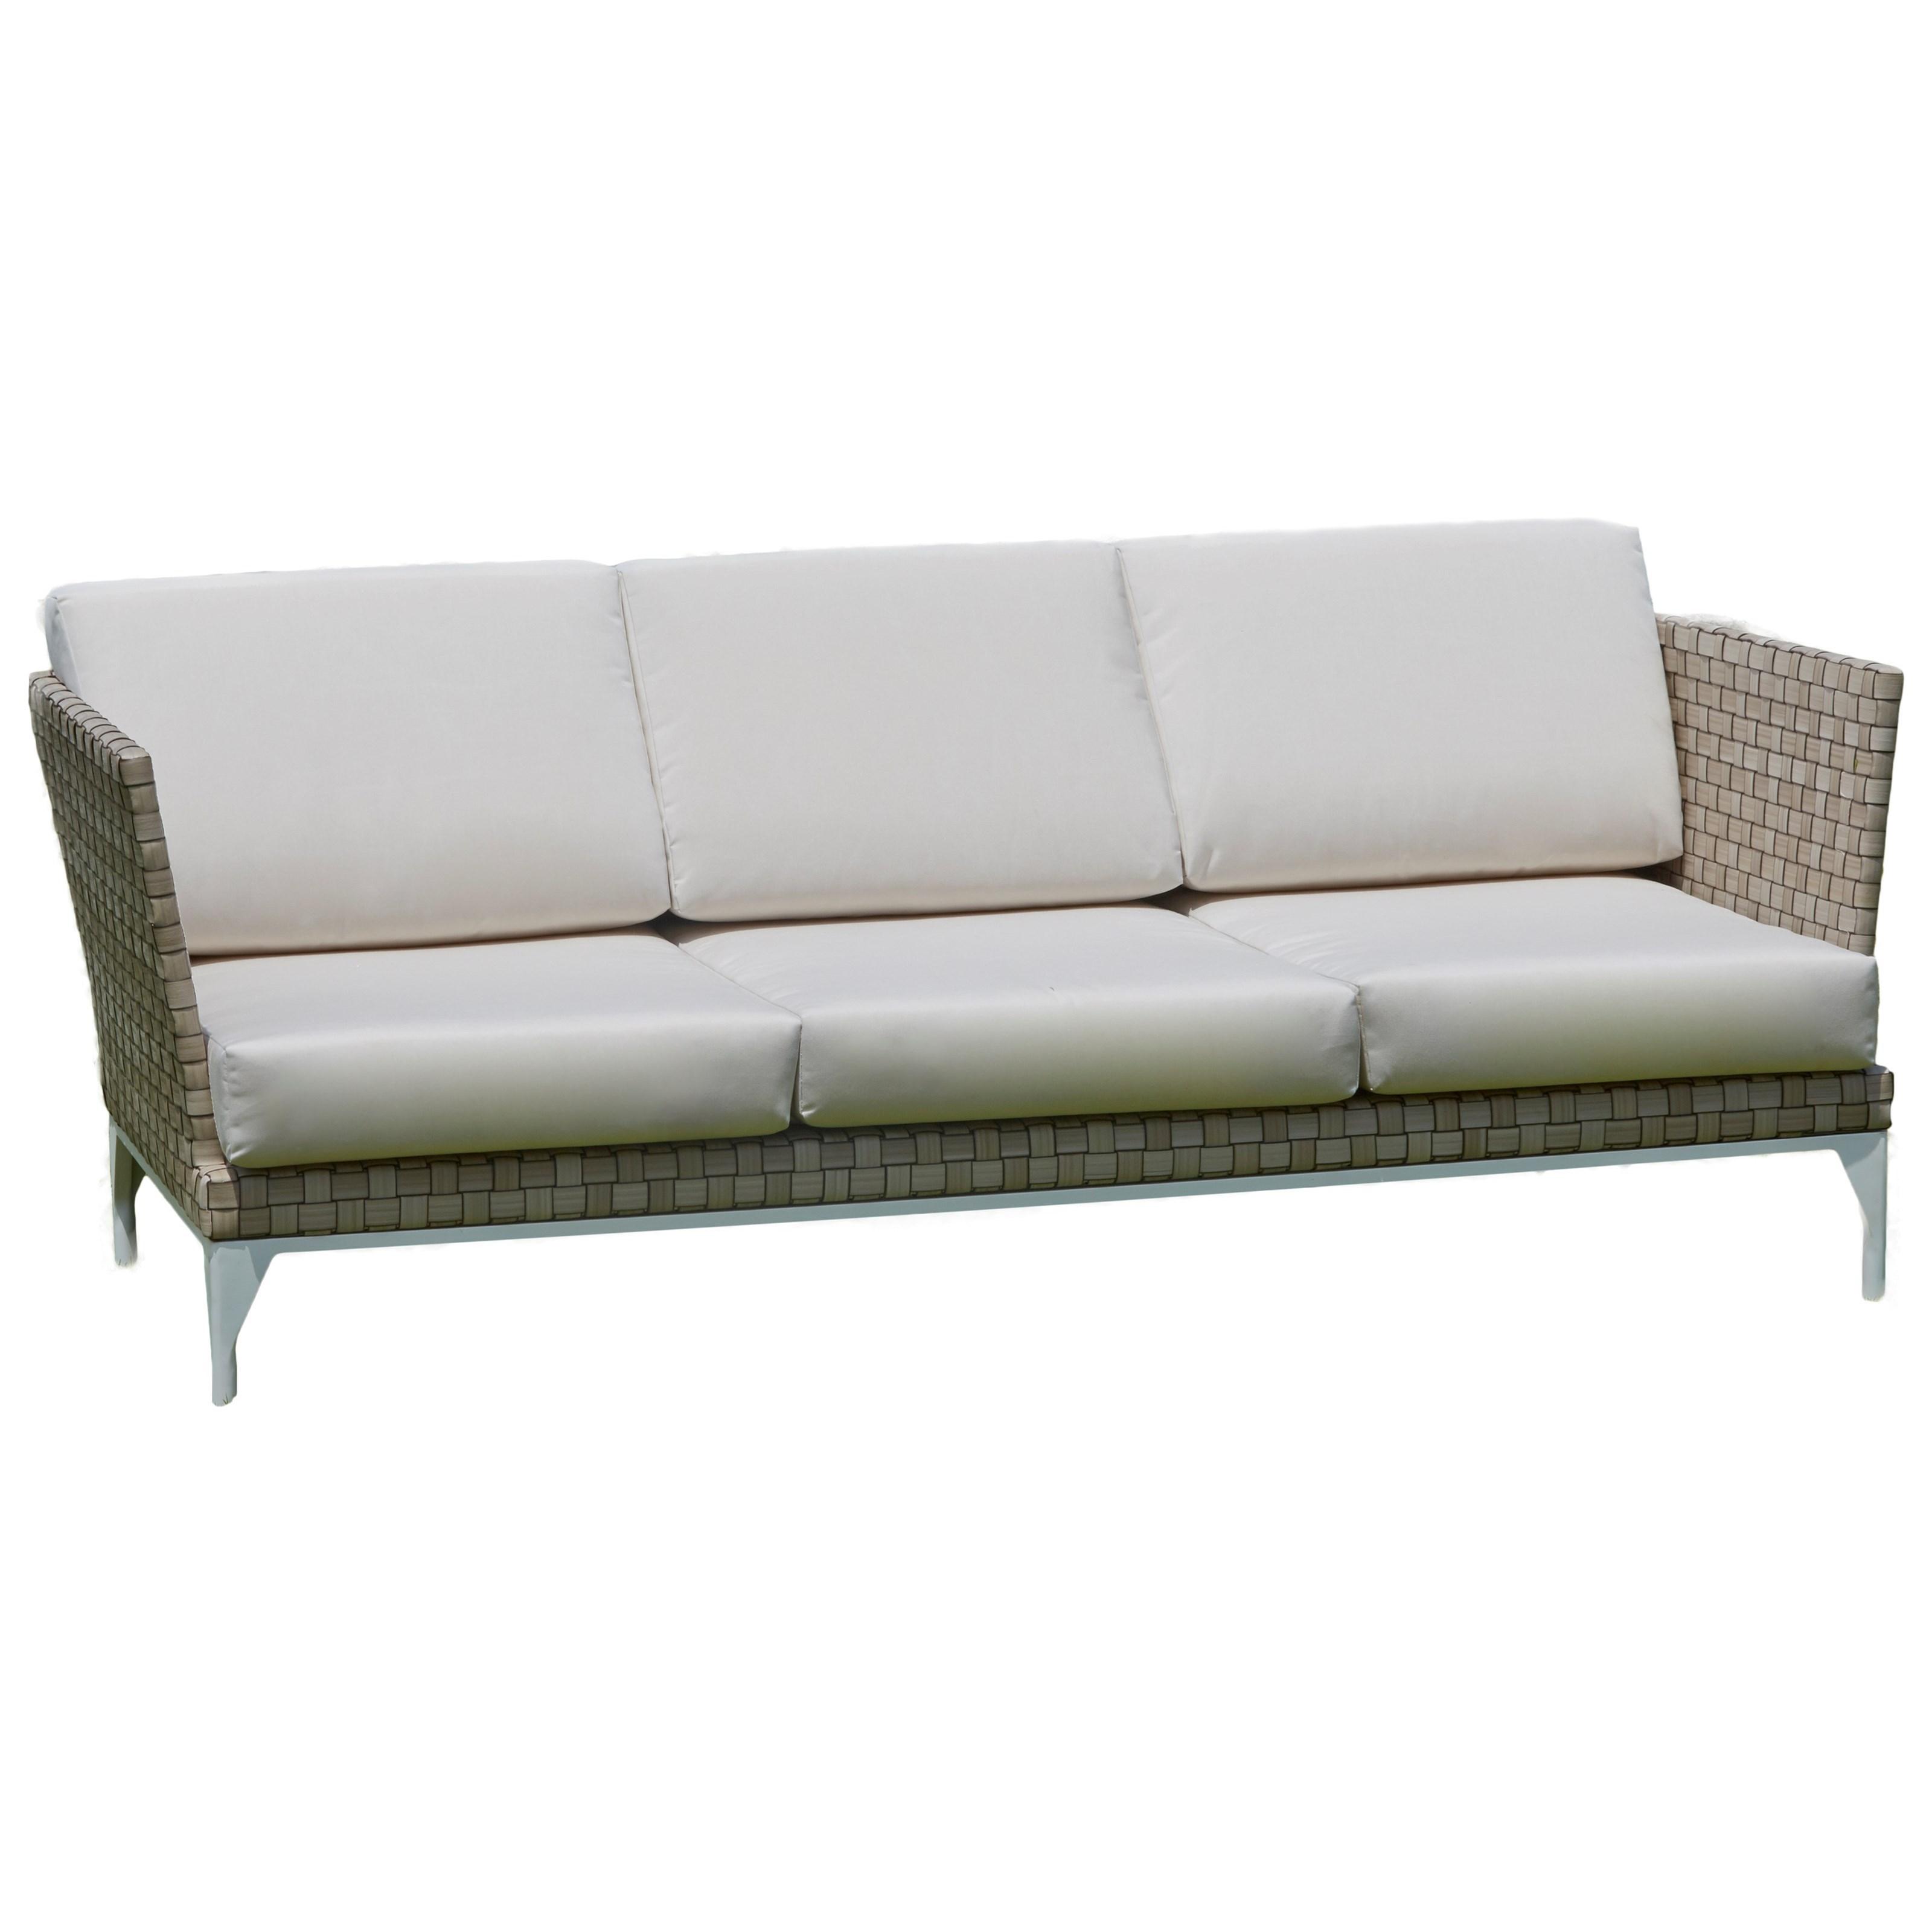 BRAFTA Outdoor Sofa by Skyline Design at Baer's Furniture